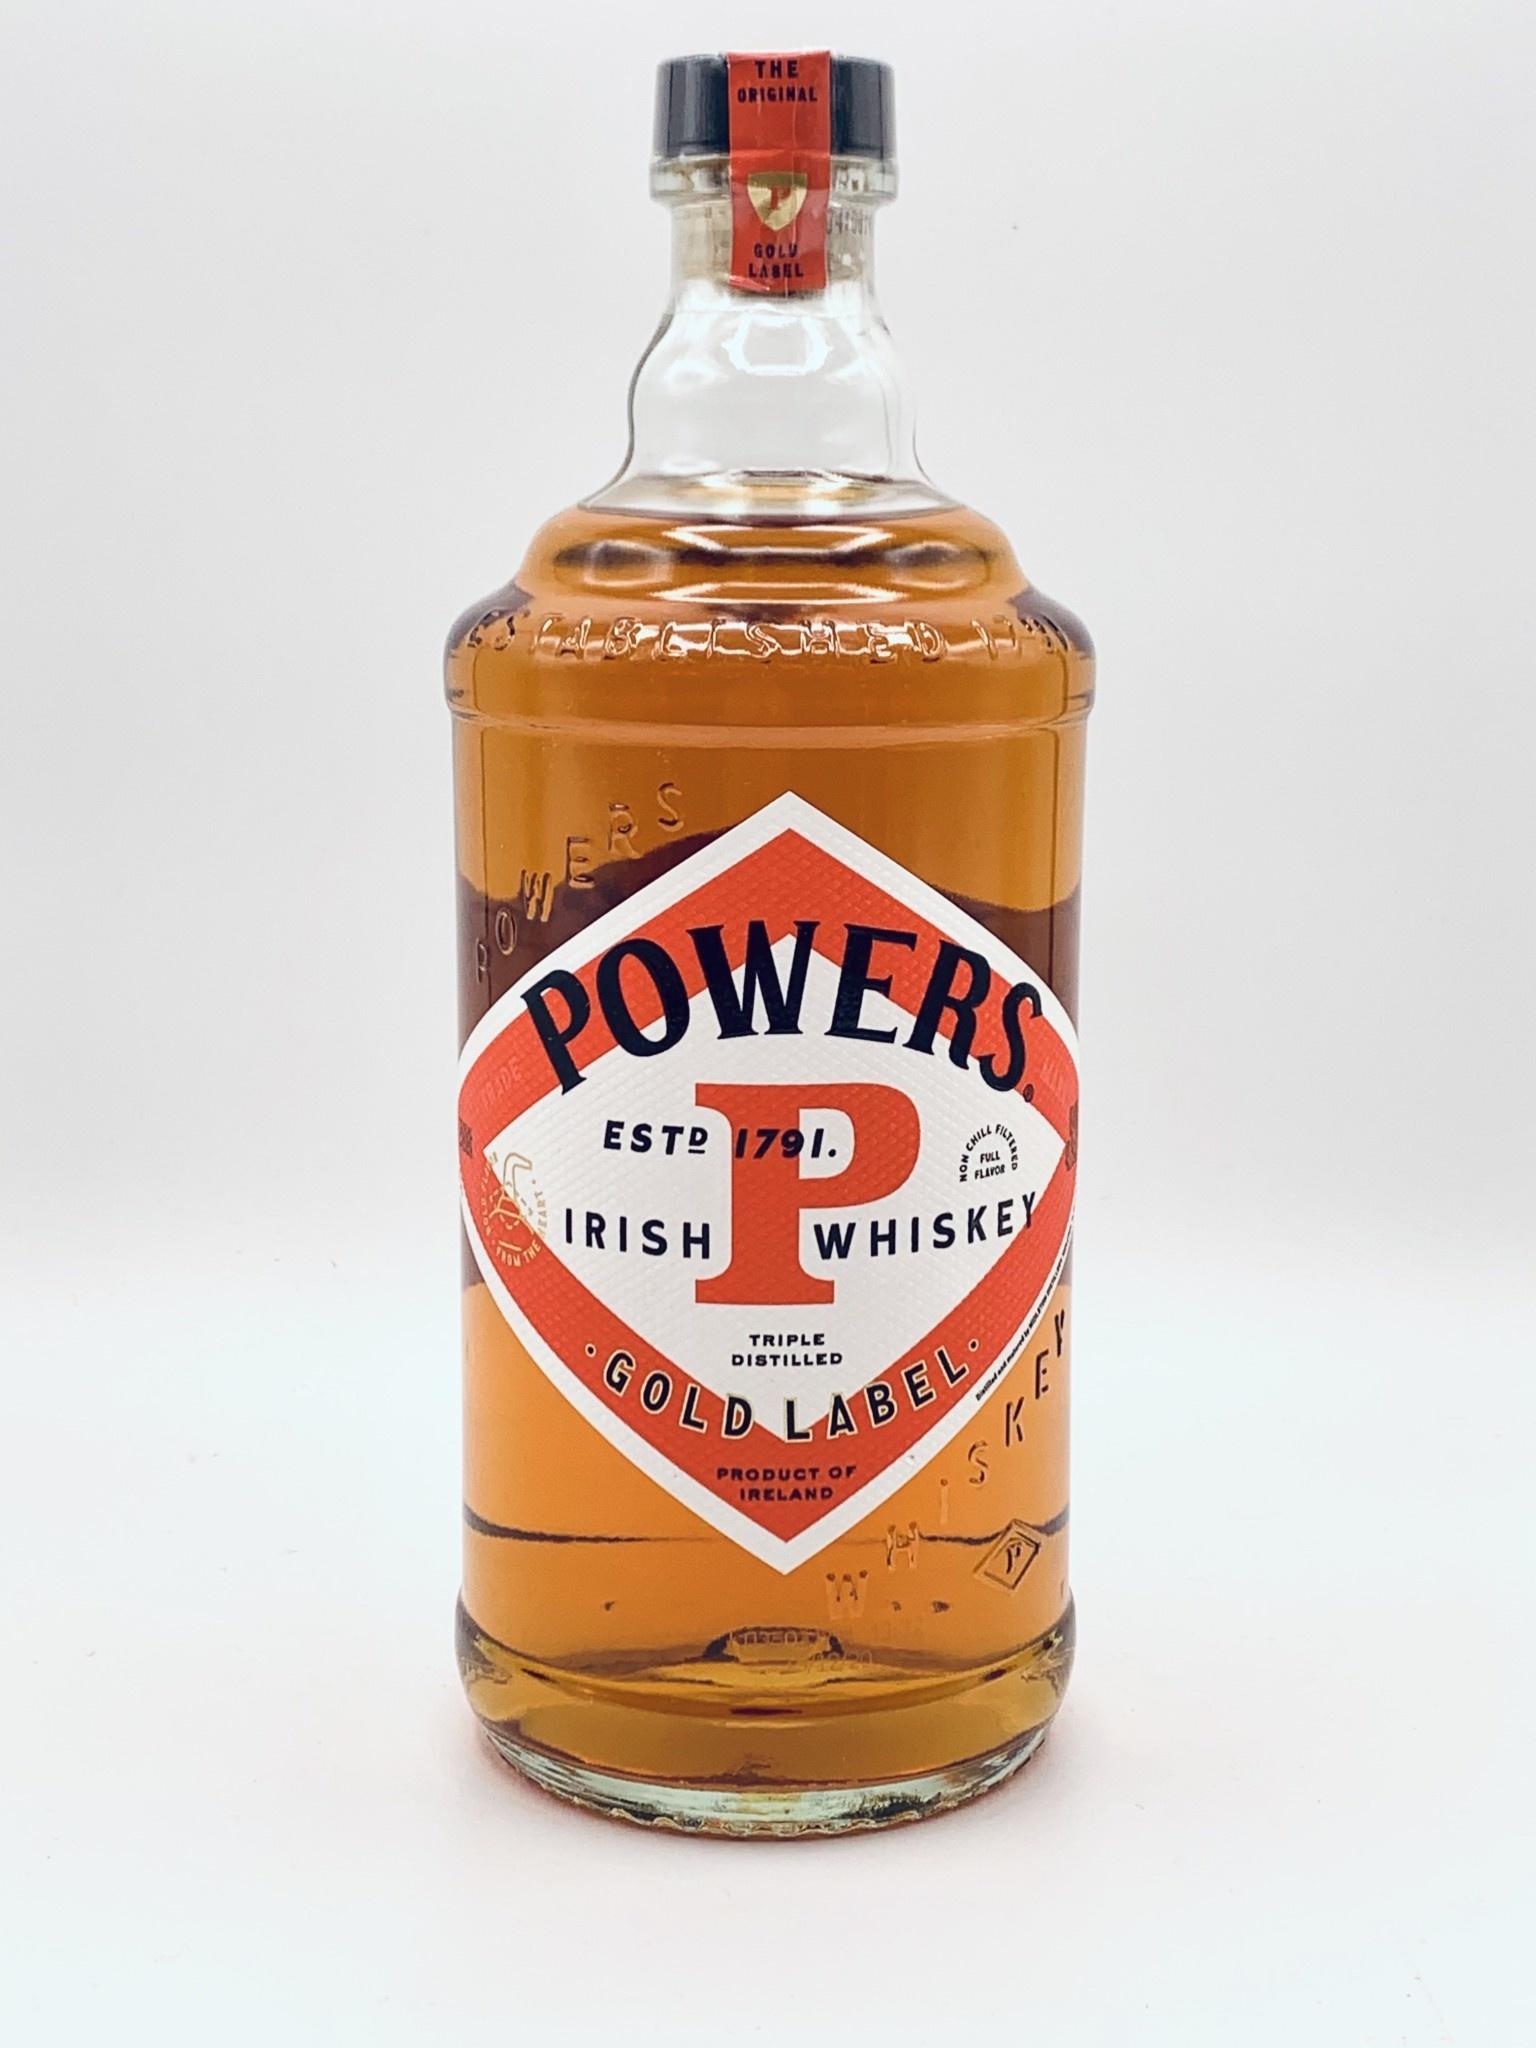 Powers Gold Label Irish Whiskey 750ml (86.4proof)